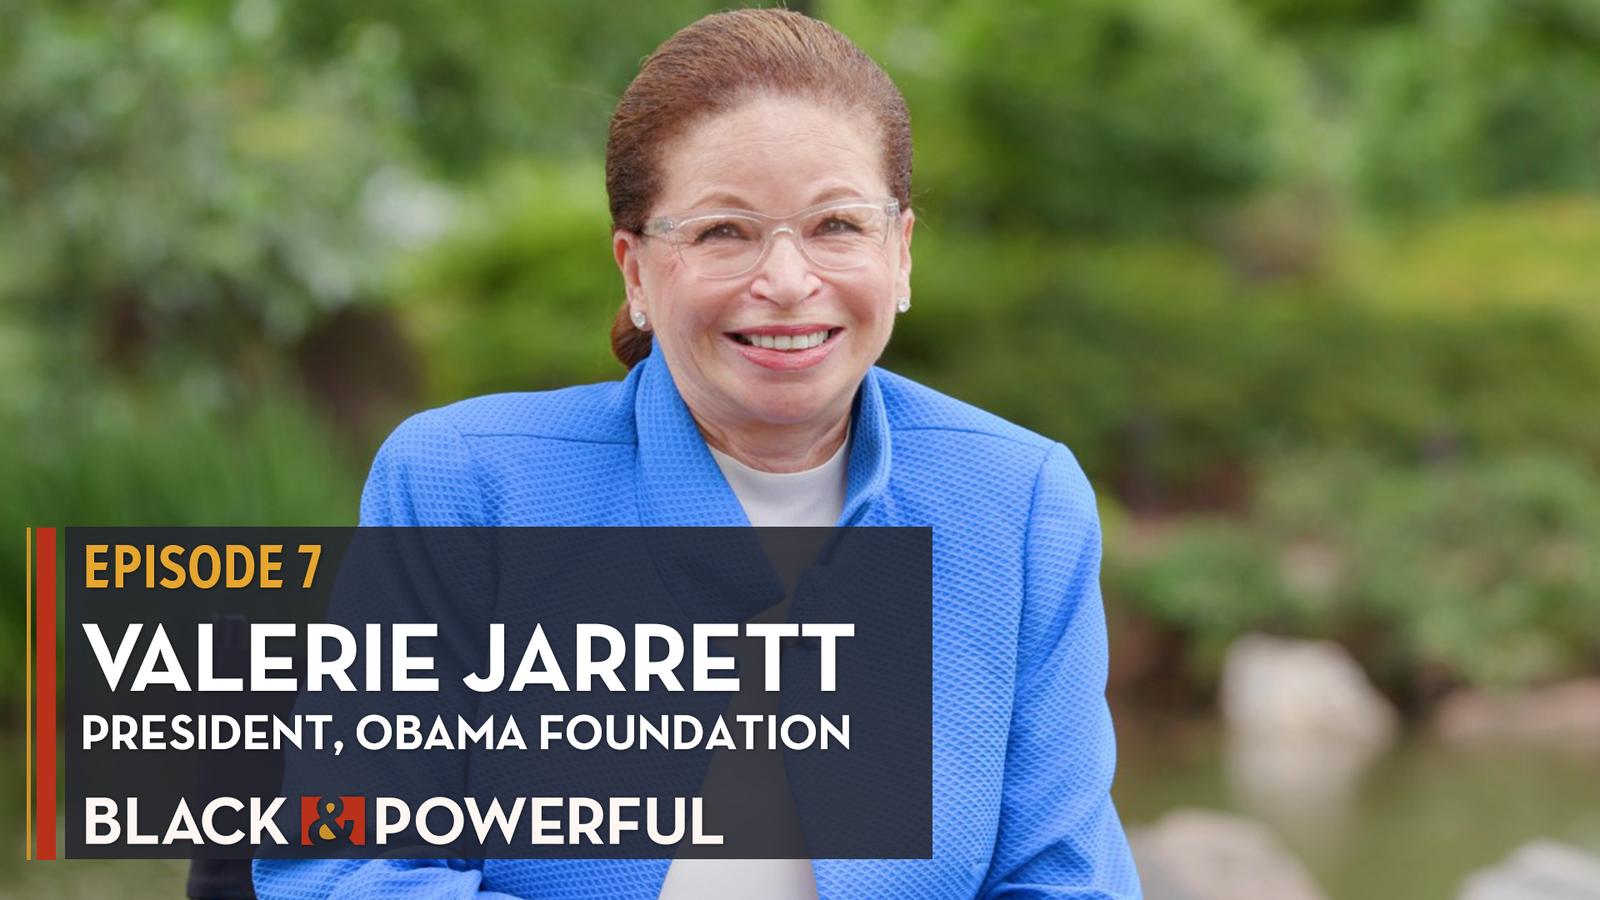 Black & Powerful: Valerie Jarrett, Obama Foundation President